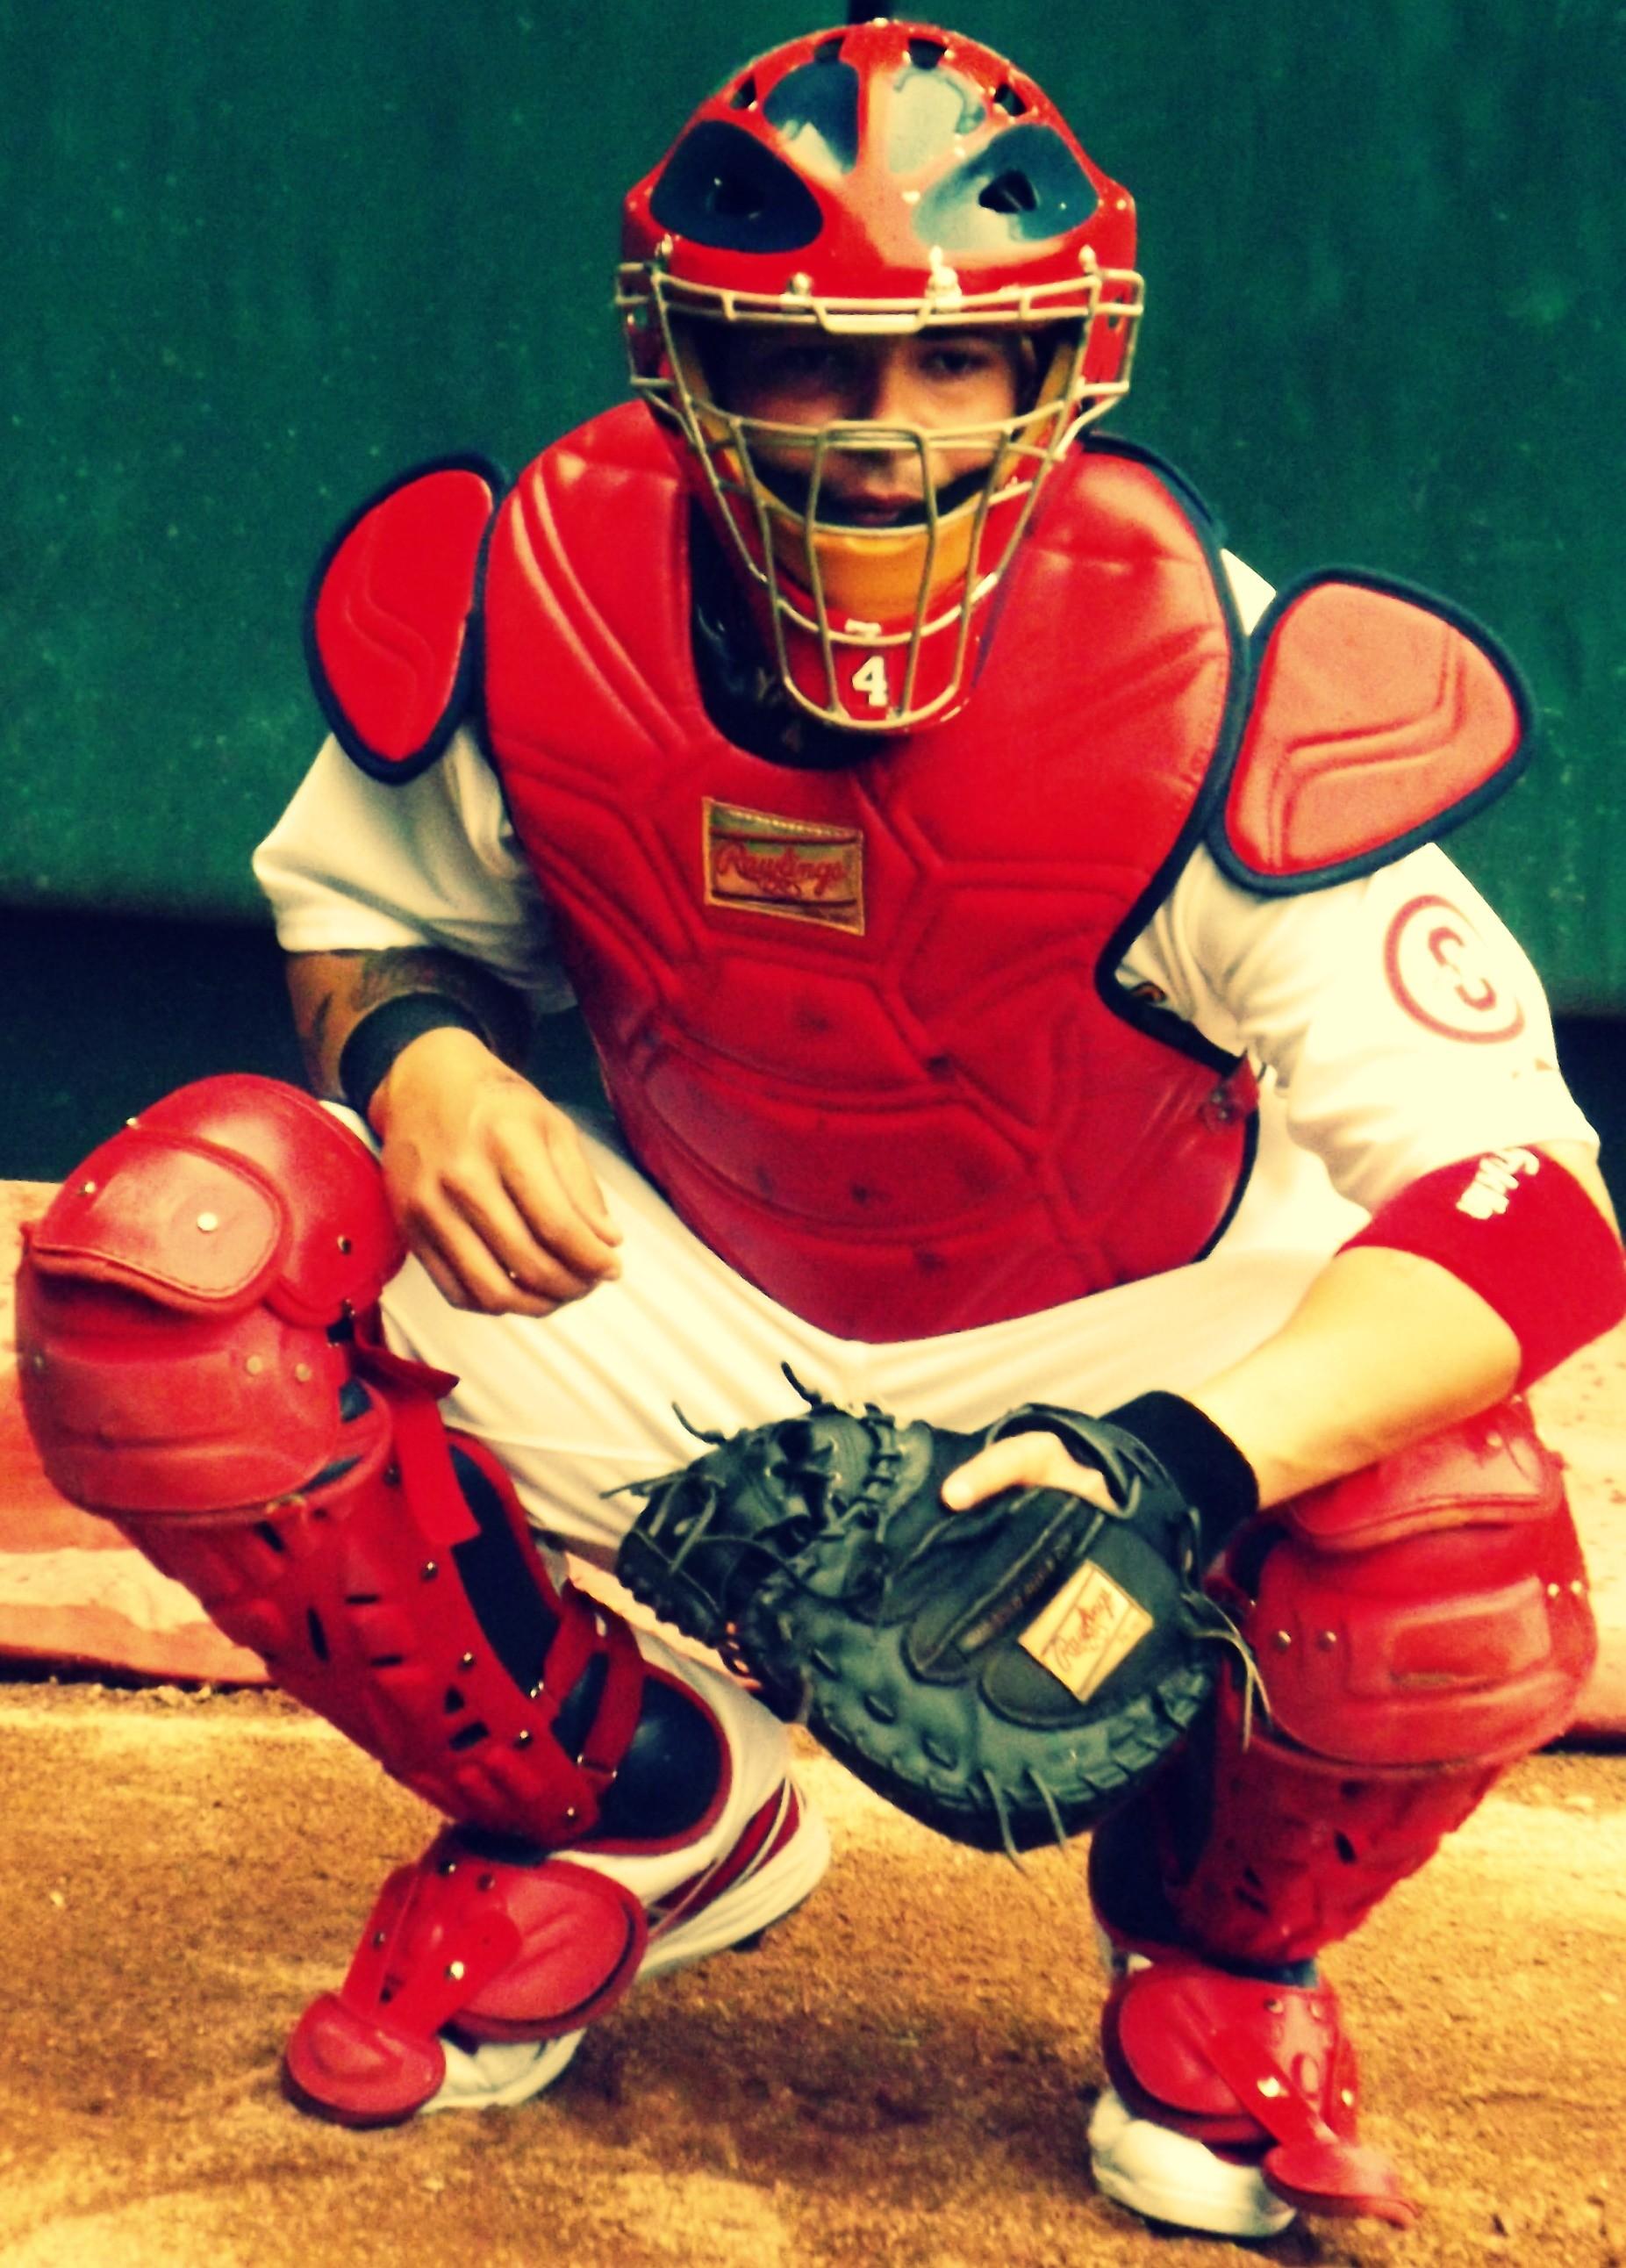 Explore St Louis Cardinals Baseball and more!